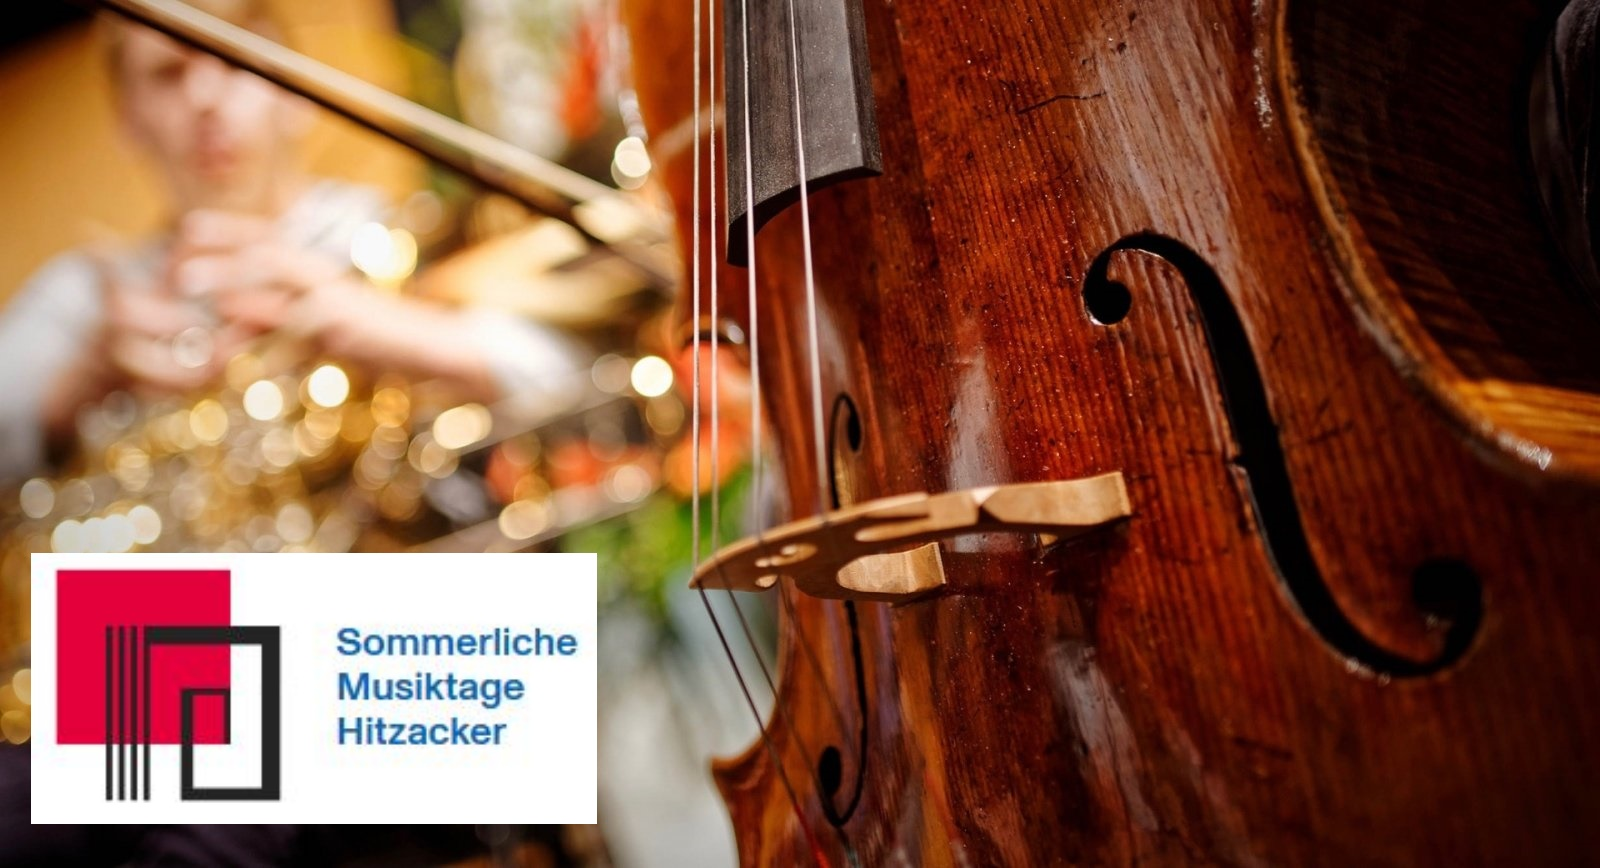 musiktage-hitzacker-heine-1331-c95d3d30